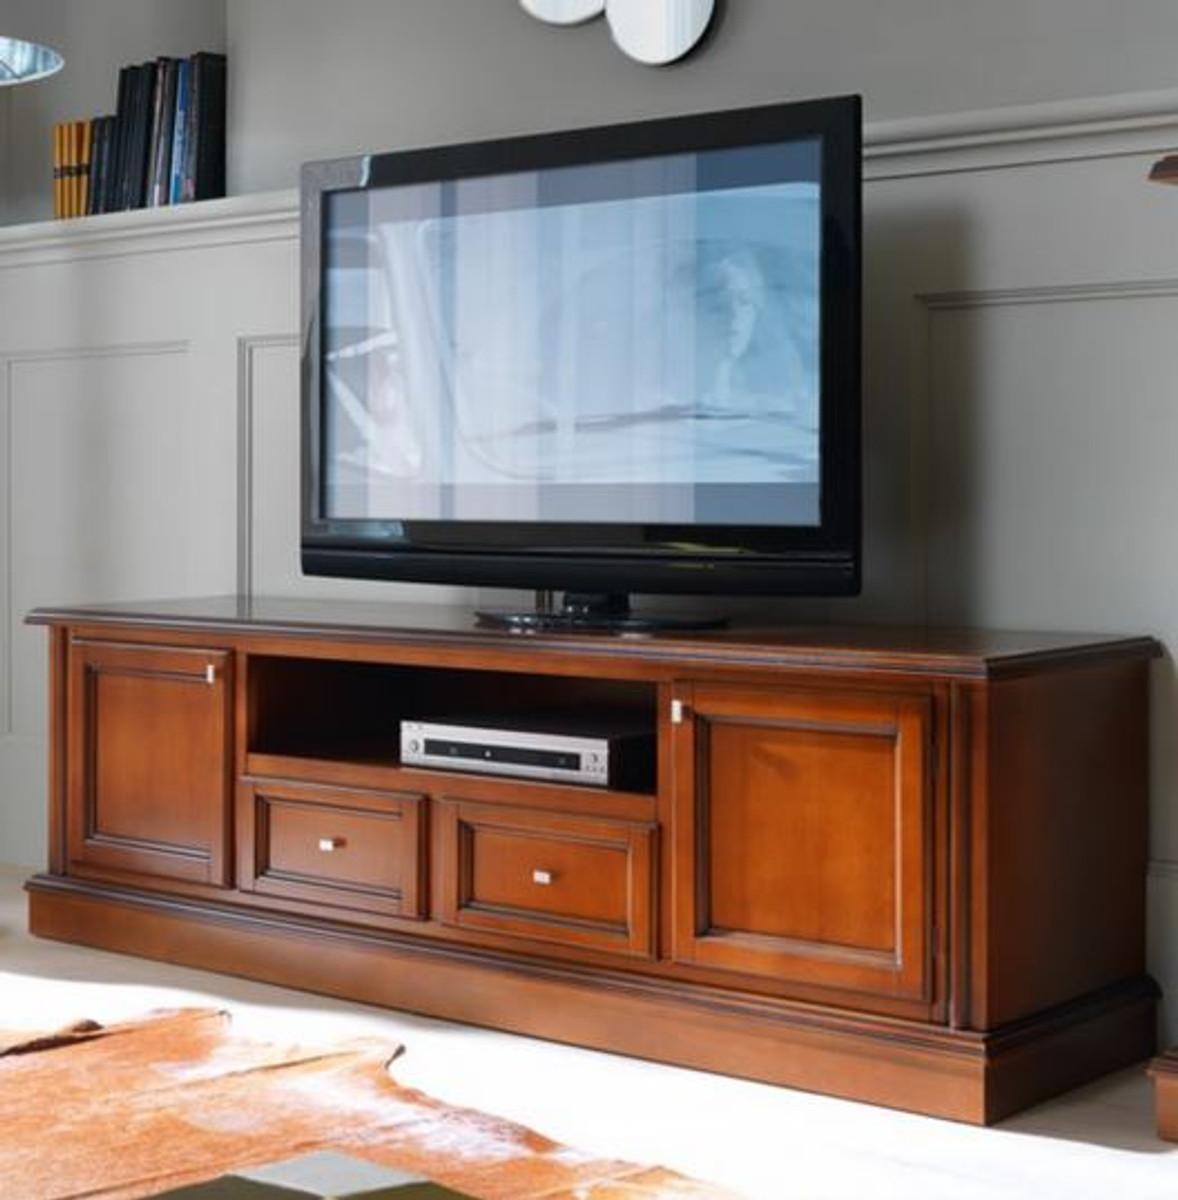 casa padrino commode luxe biedermeier tv 200 x 50 x h 61 cm meuble tv buffet meubles en bois marron